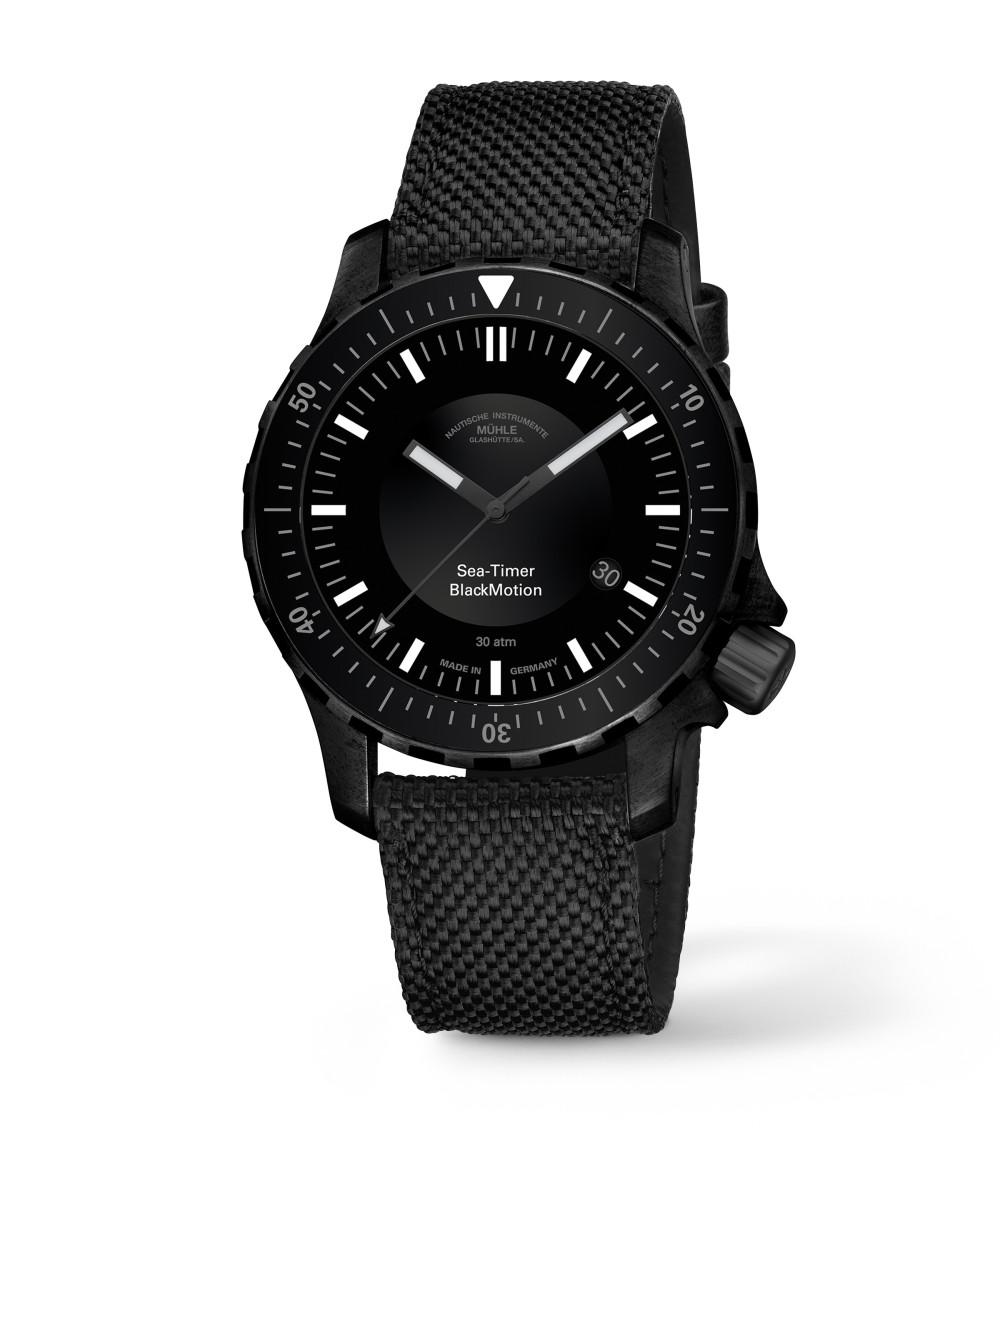 Sea-Timer BlackMotion 01